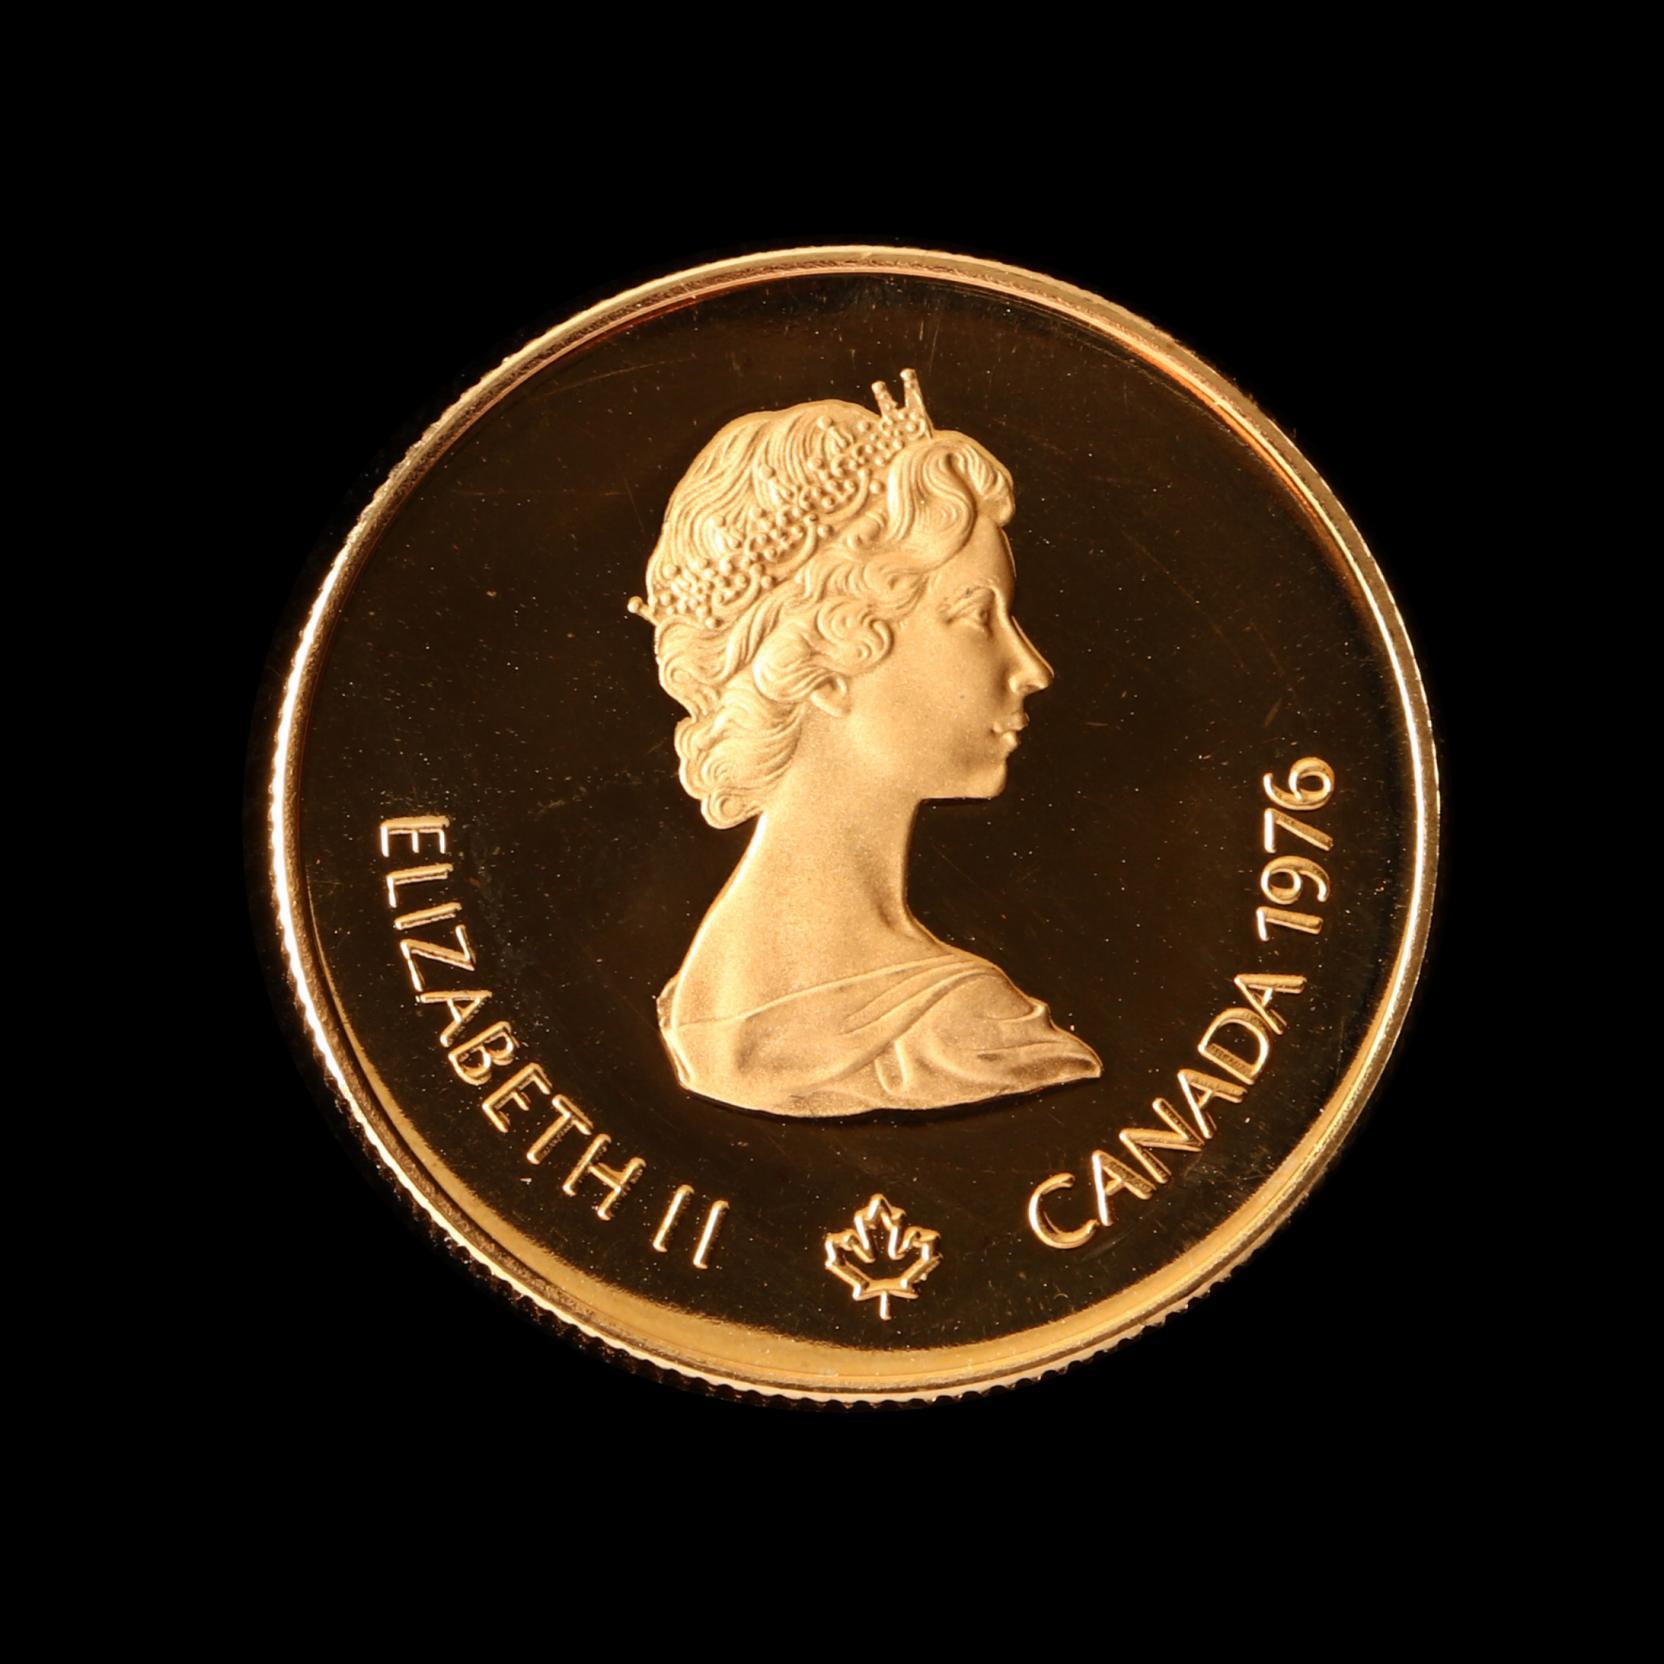 canada-1976-xxi-olympiad-100-proof-half-ounce-gold-coin